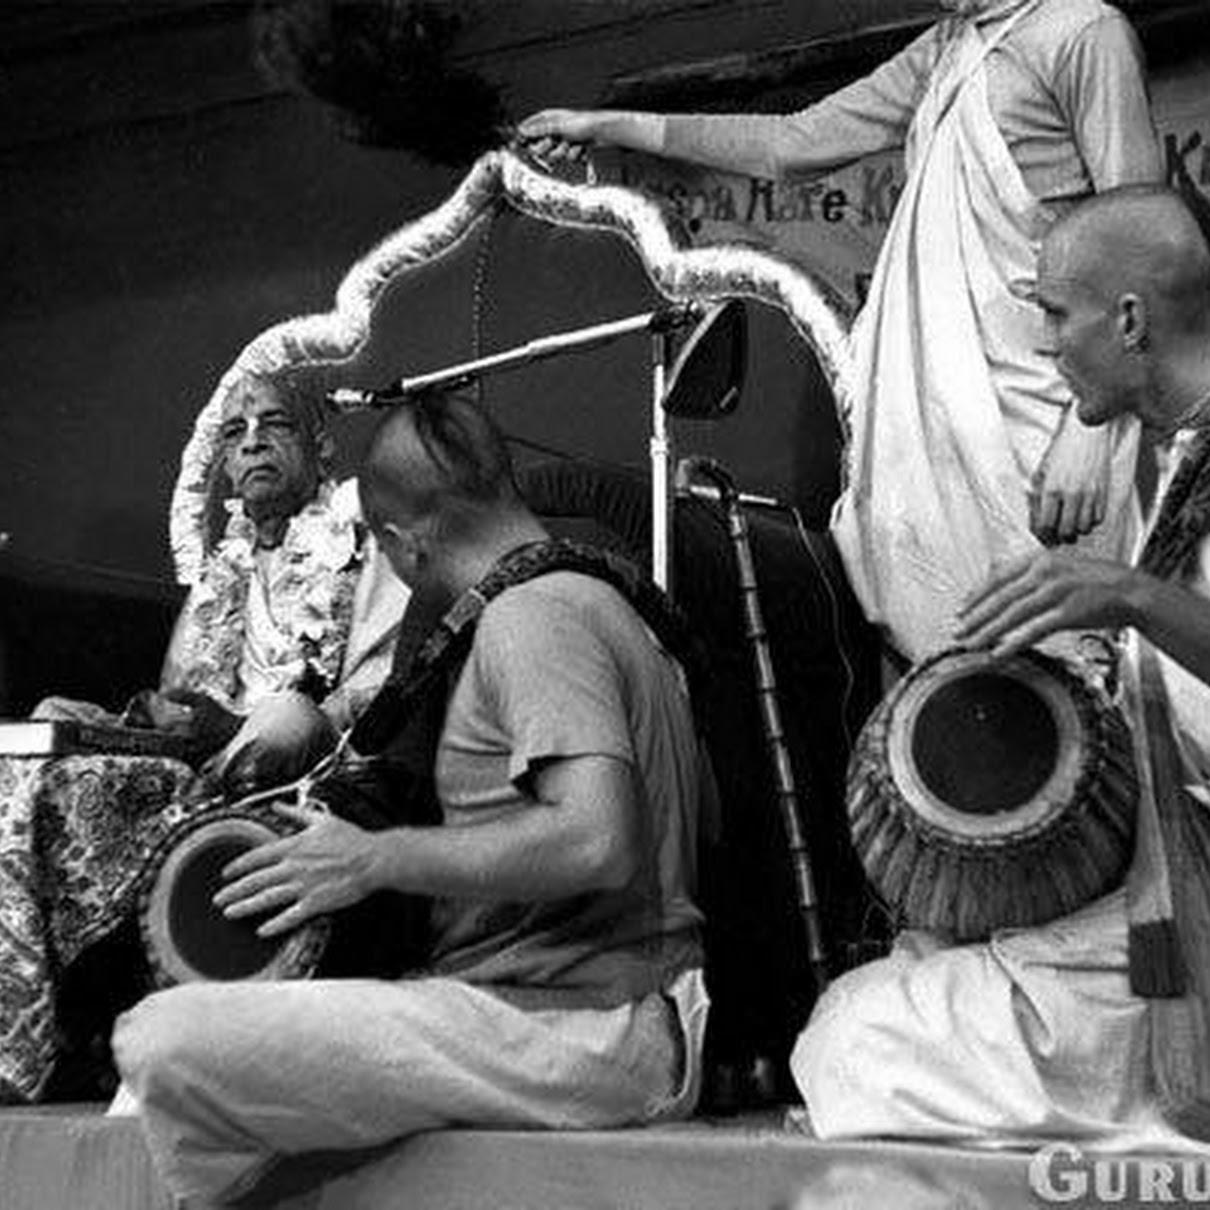 Gurudeva